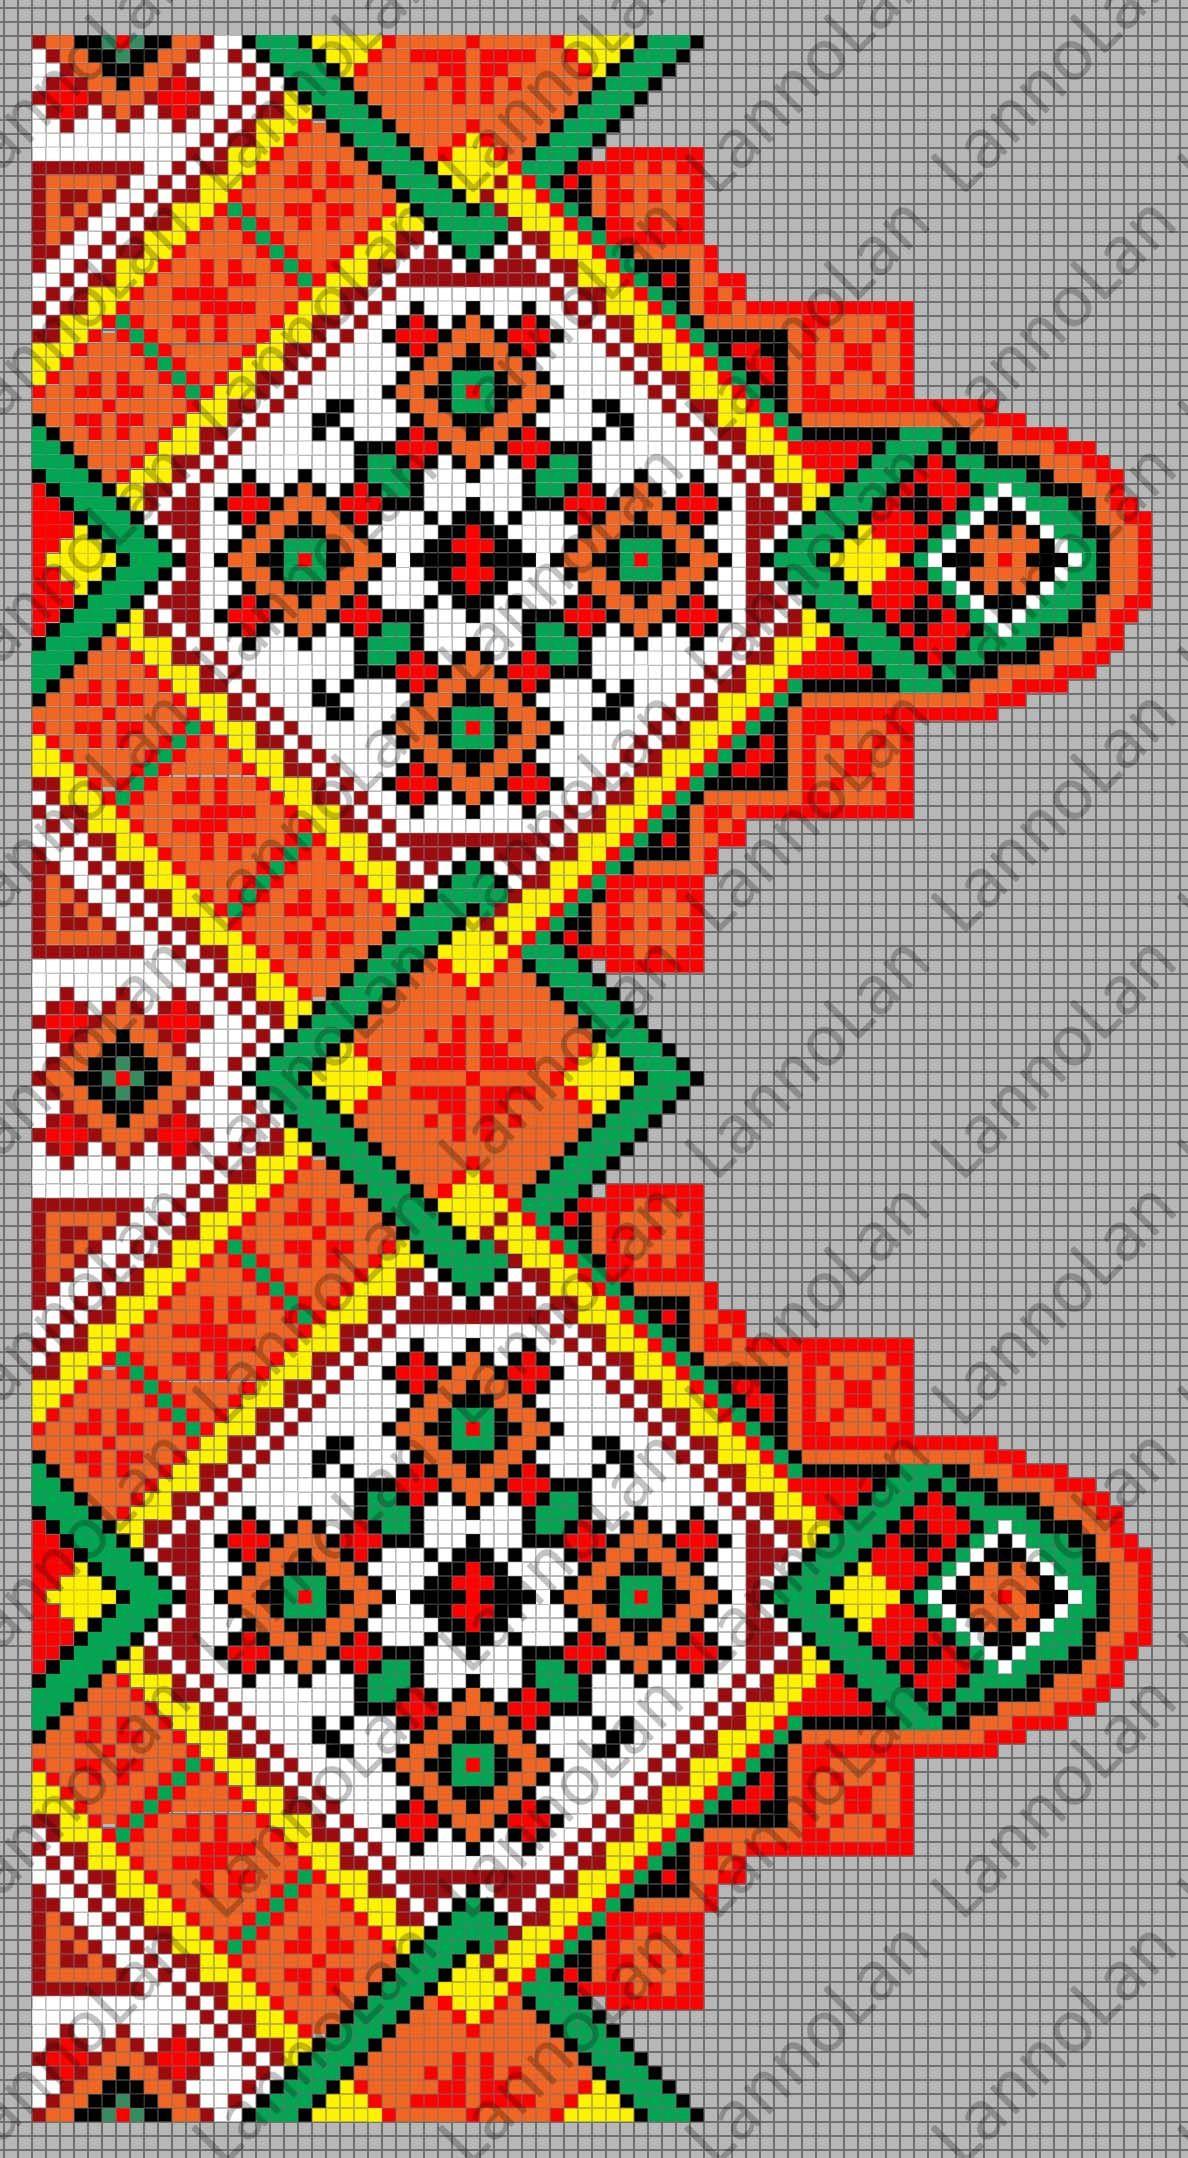 ukrainian cross stitch pattern ... inspired by: http://svetik67.gallery.ru/watch?ph=7Q6-ew0zz